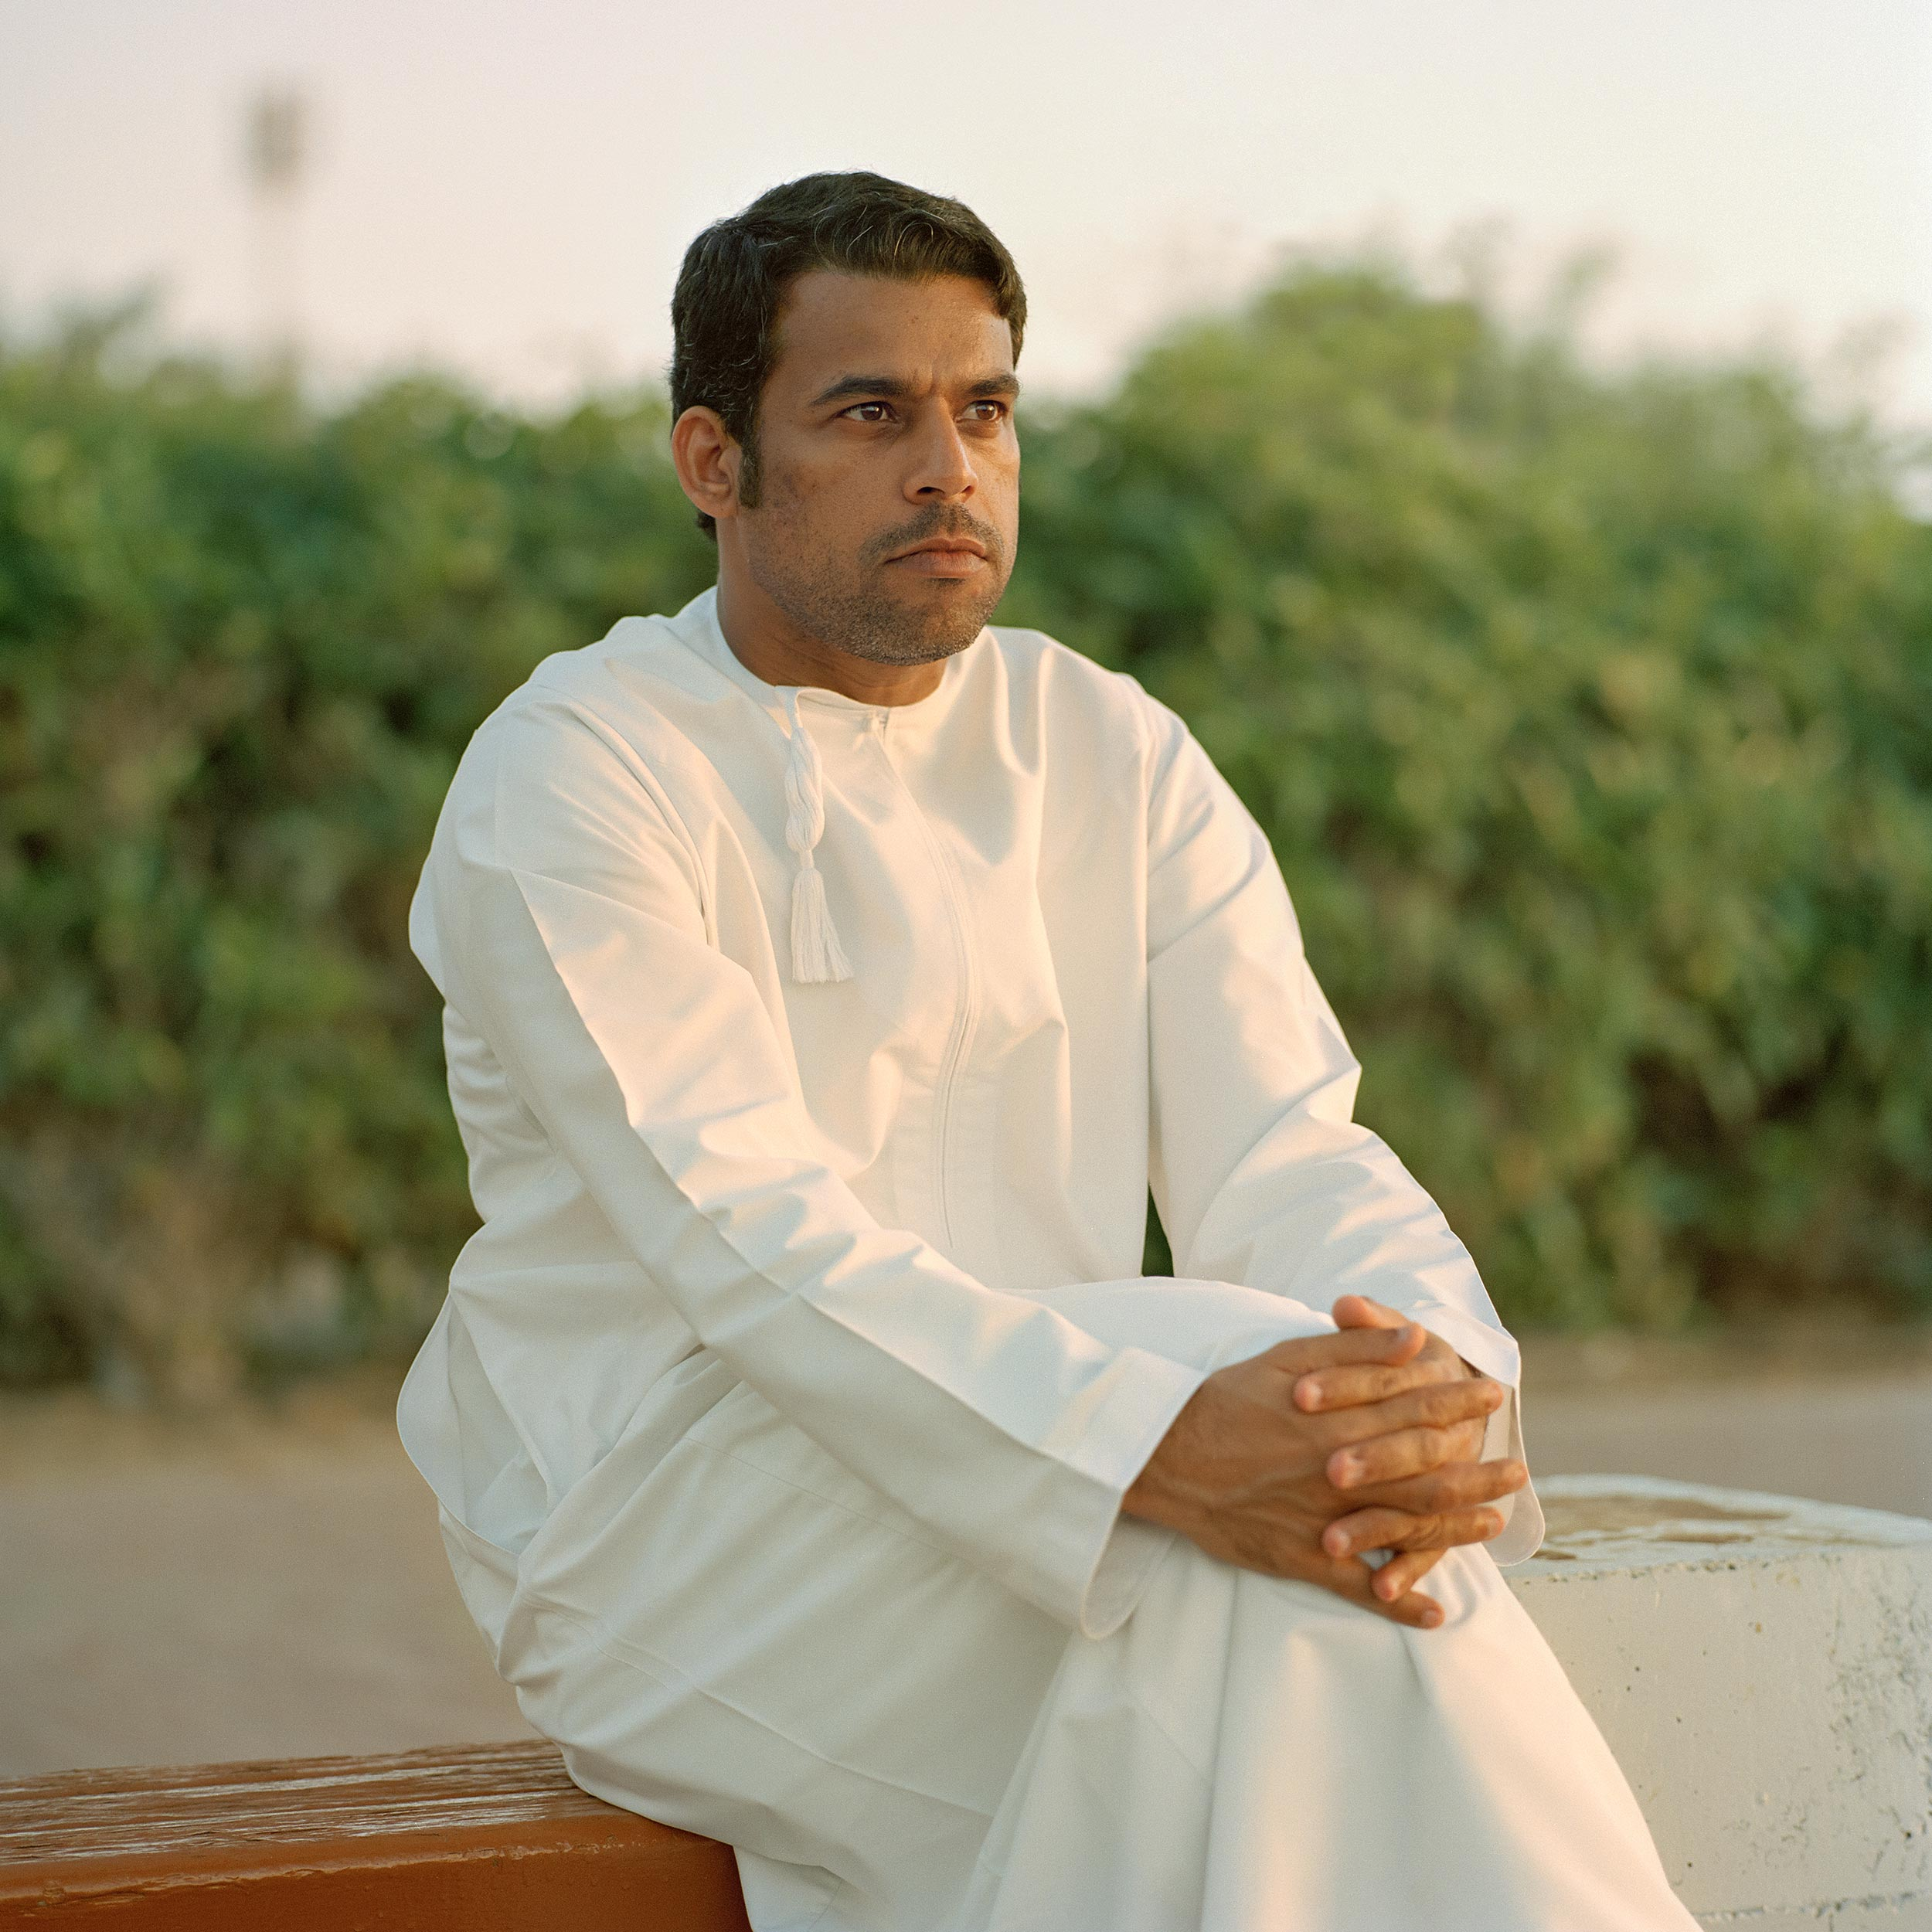 photograph of man sitting on bench wearing dishdasha from series XO